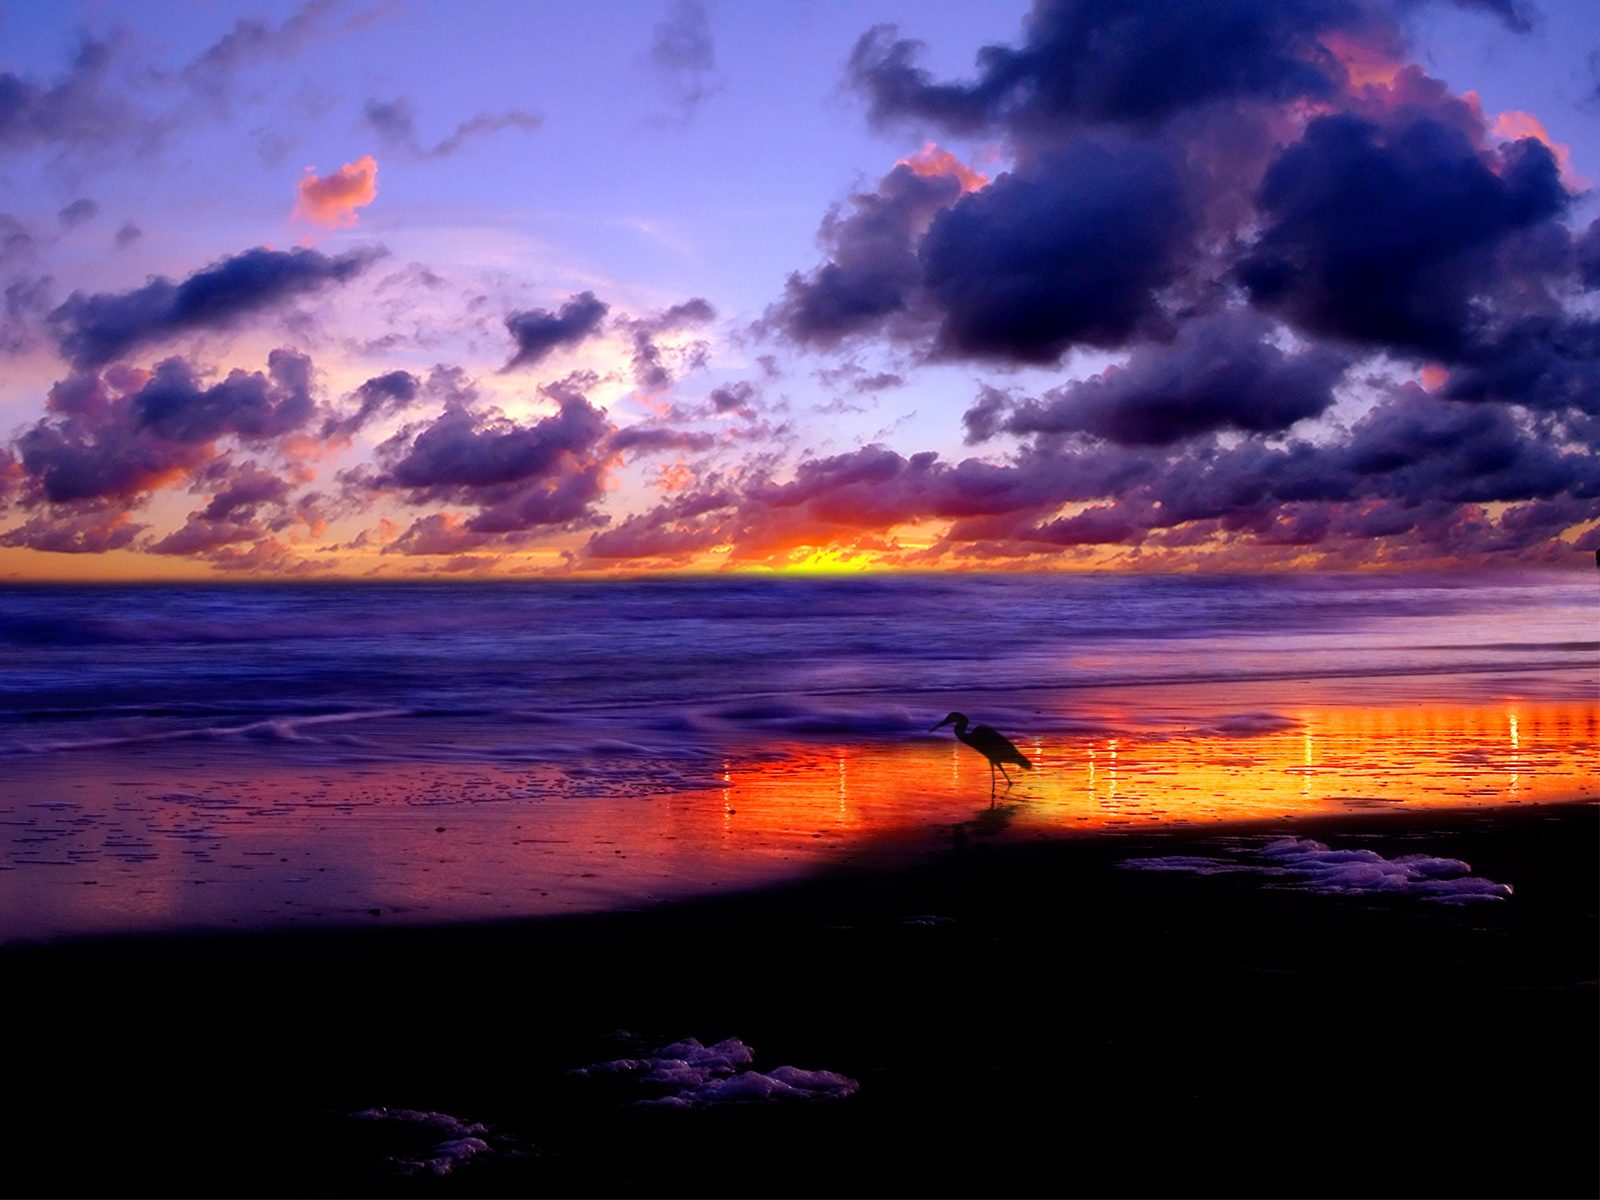 http://2.bp.blogspot.com/-yDVUUPie-lk/TkYneUYZEvI/AAAAAAAADB8/MqW9dTY035E/s1600/nature_003_1600x.jpg